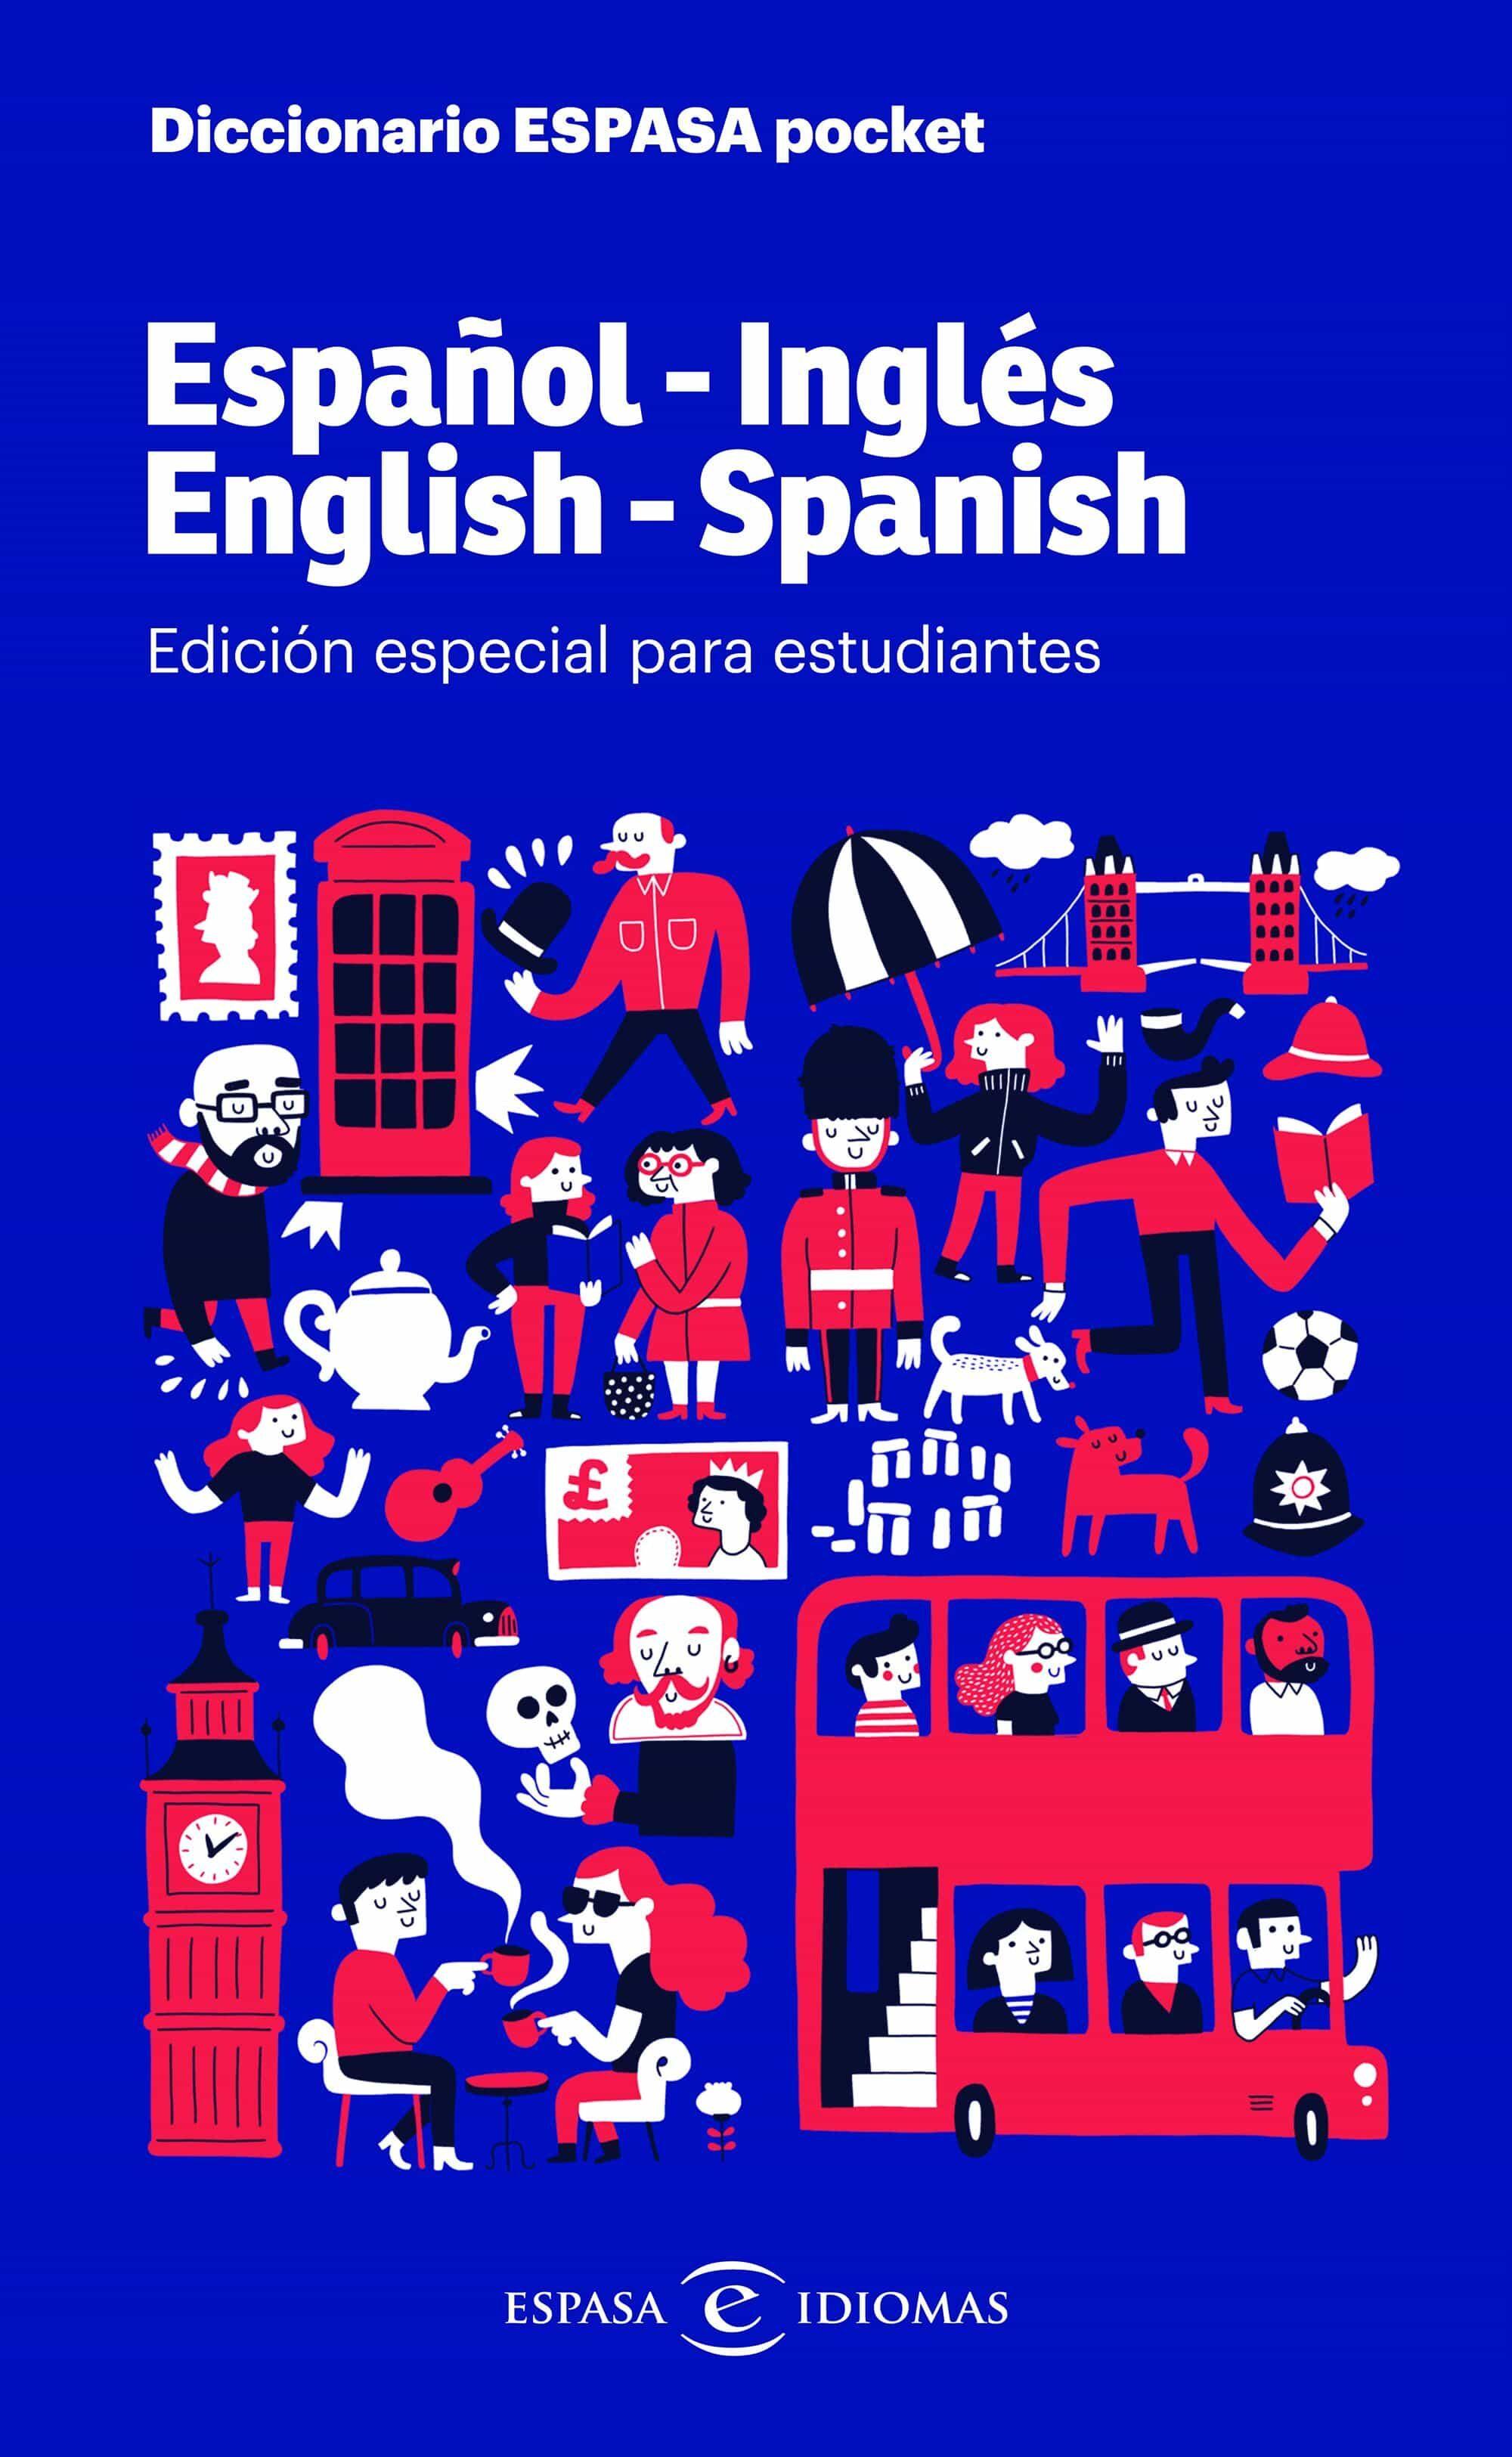 Diccionario Espasa Pocket Español-ingles / English-spanish - Espasa